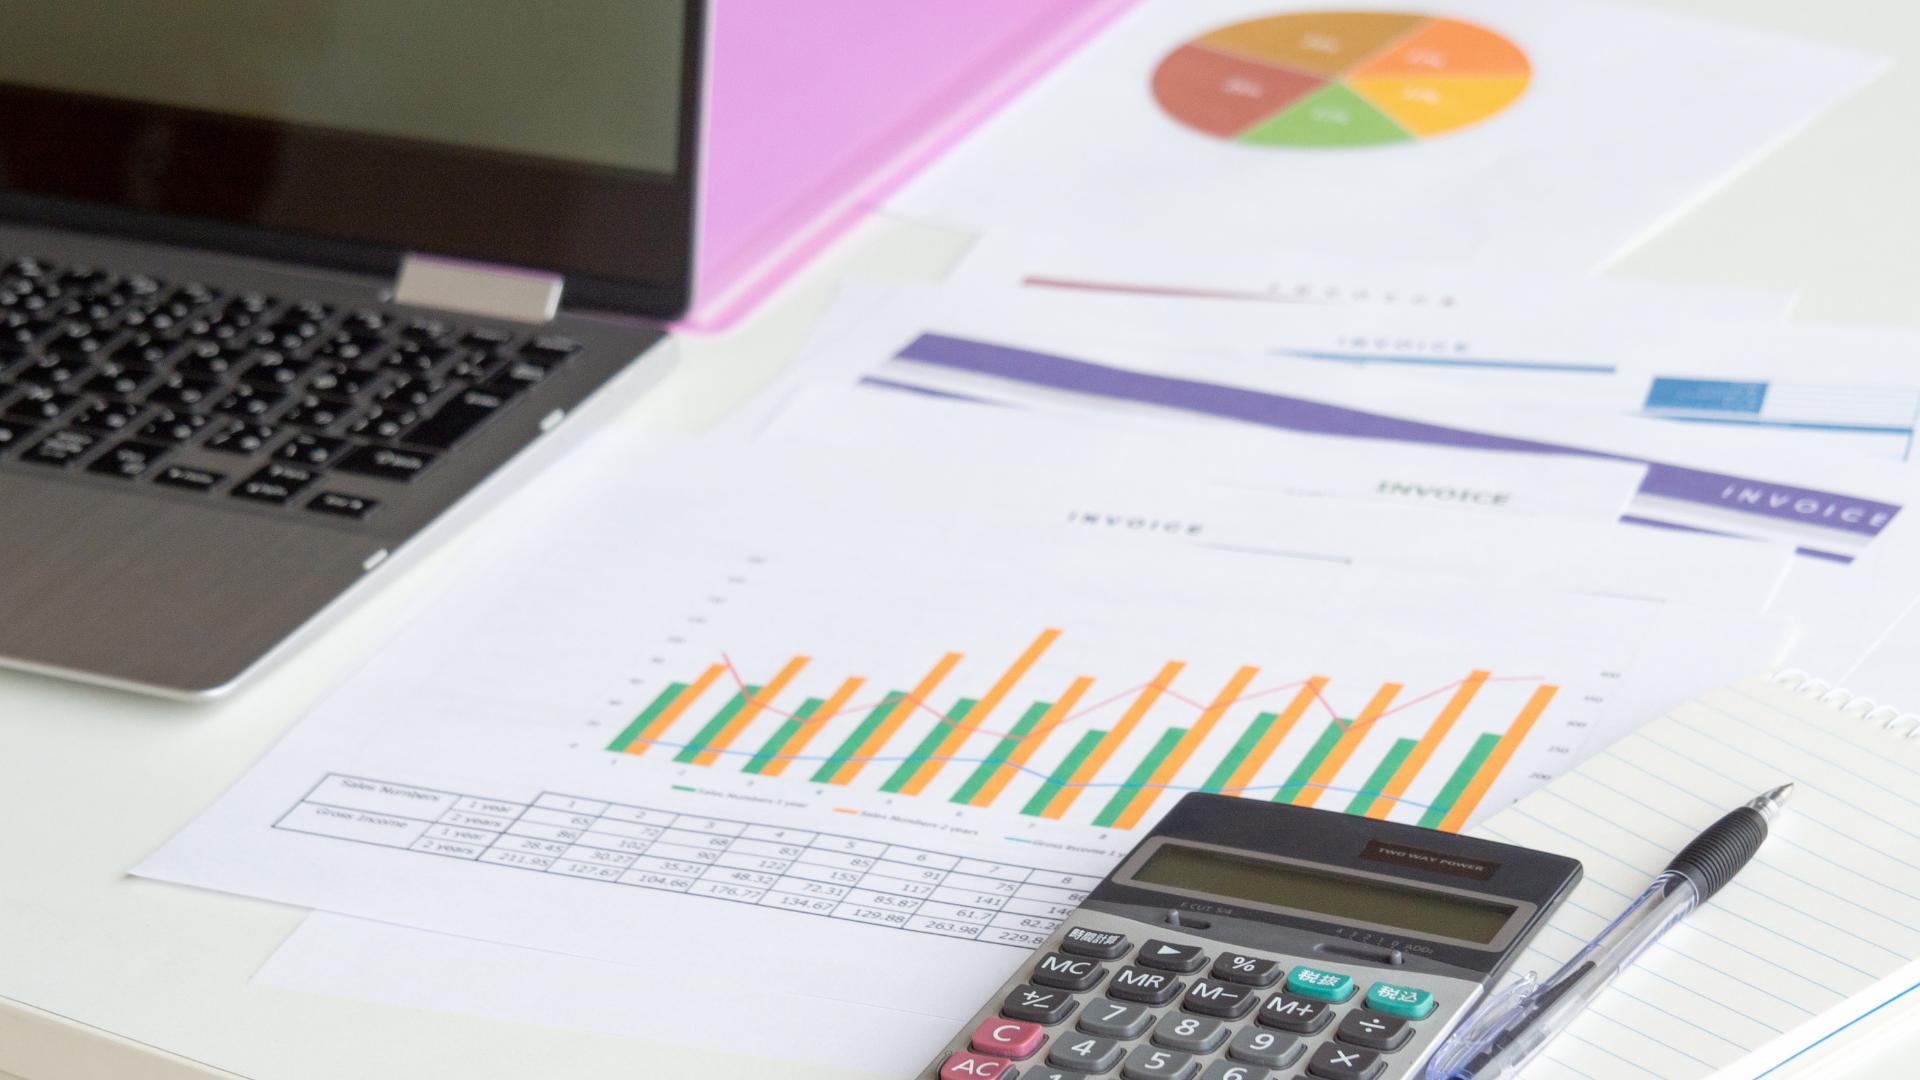 BIWF39: Conheça o BDR do ETF iShares Russell 1000 Growth